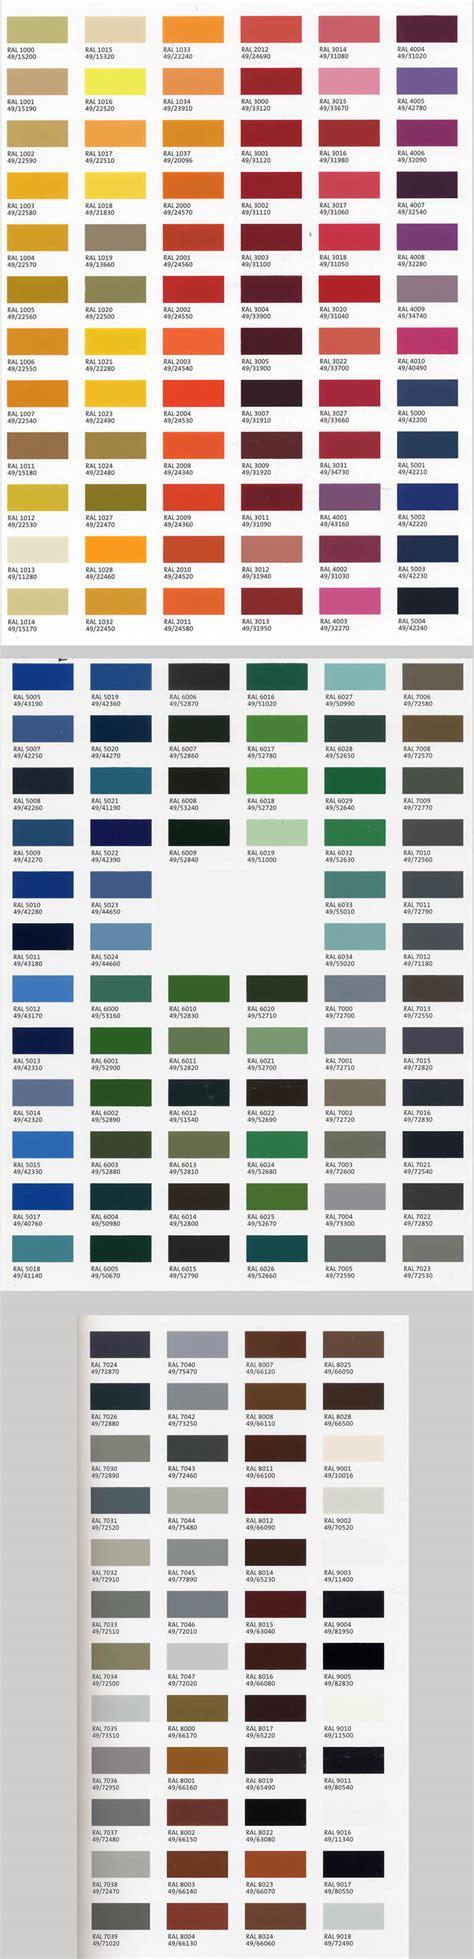 sherwin williams powder 2017 grasscloth wallpaper sherwin williams powder coat colors 2017 grasscloth